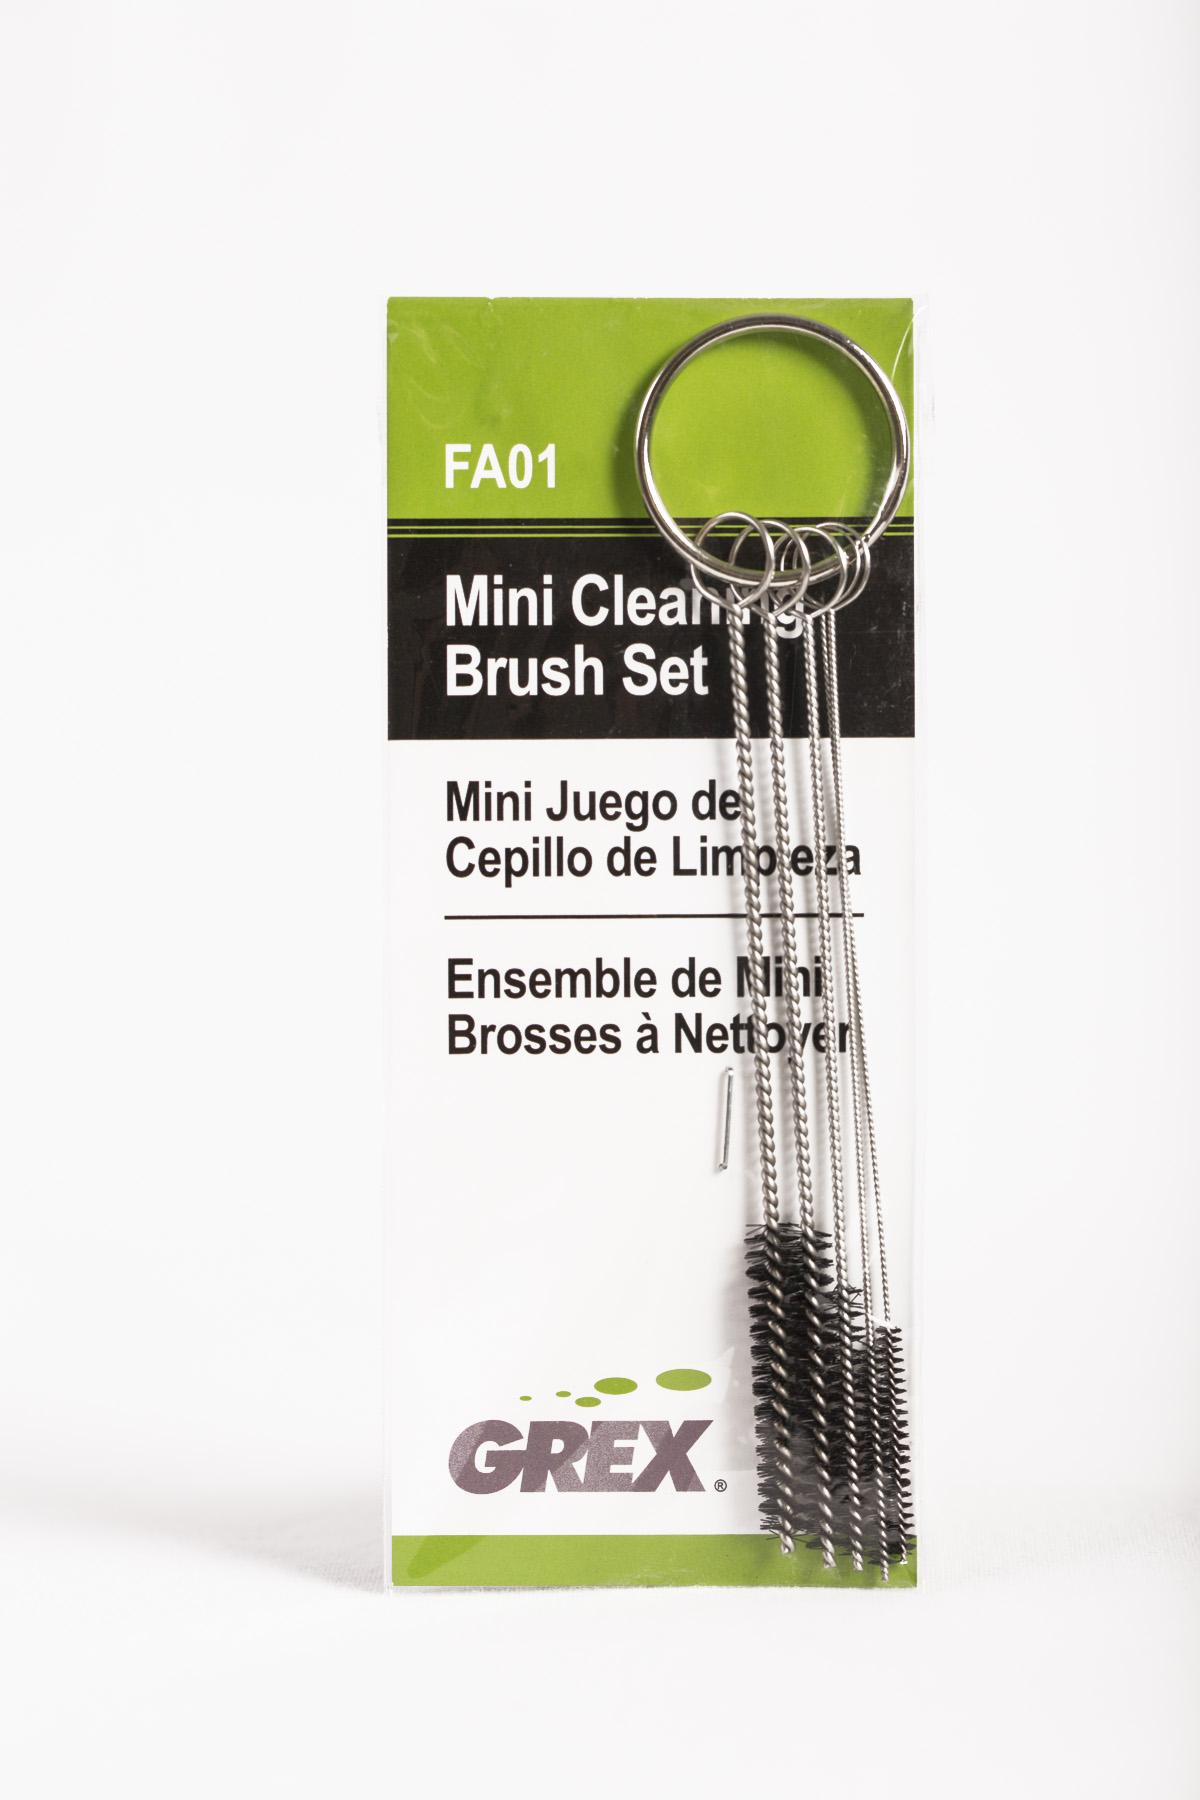 FA01 - Mini Cleaning Brush Set